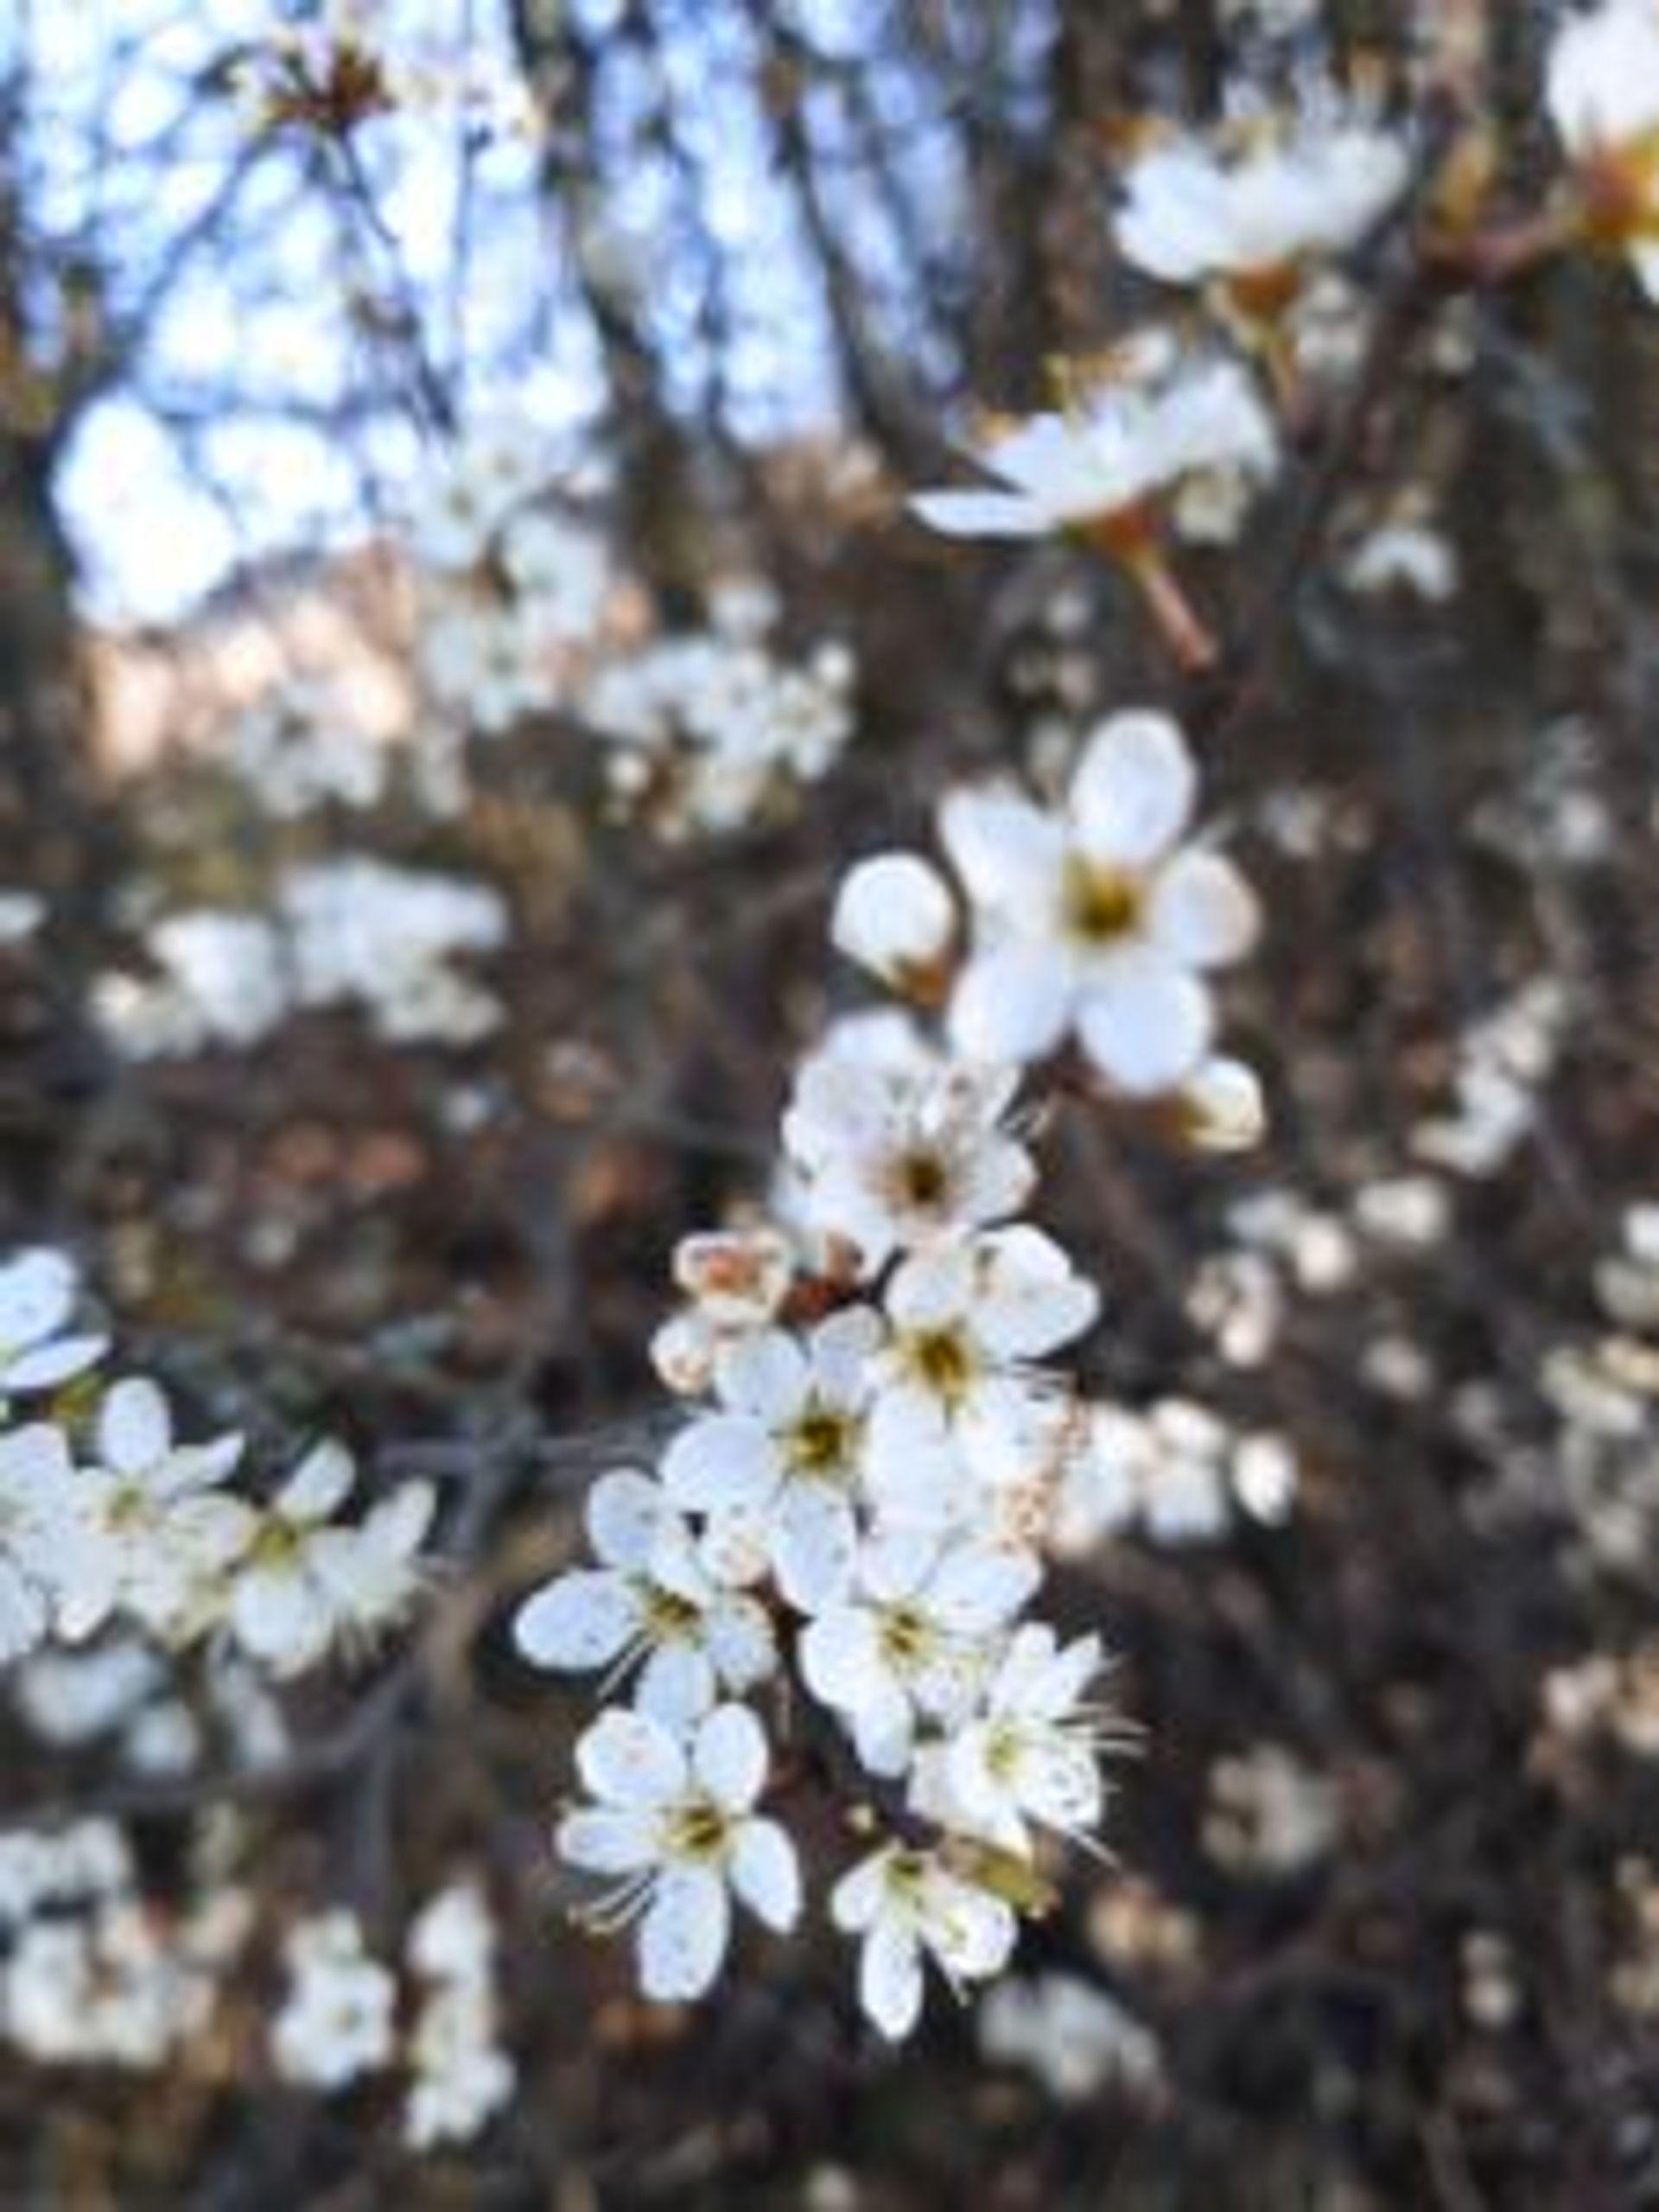 White plum flowers.